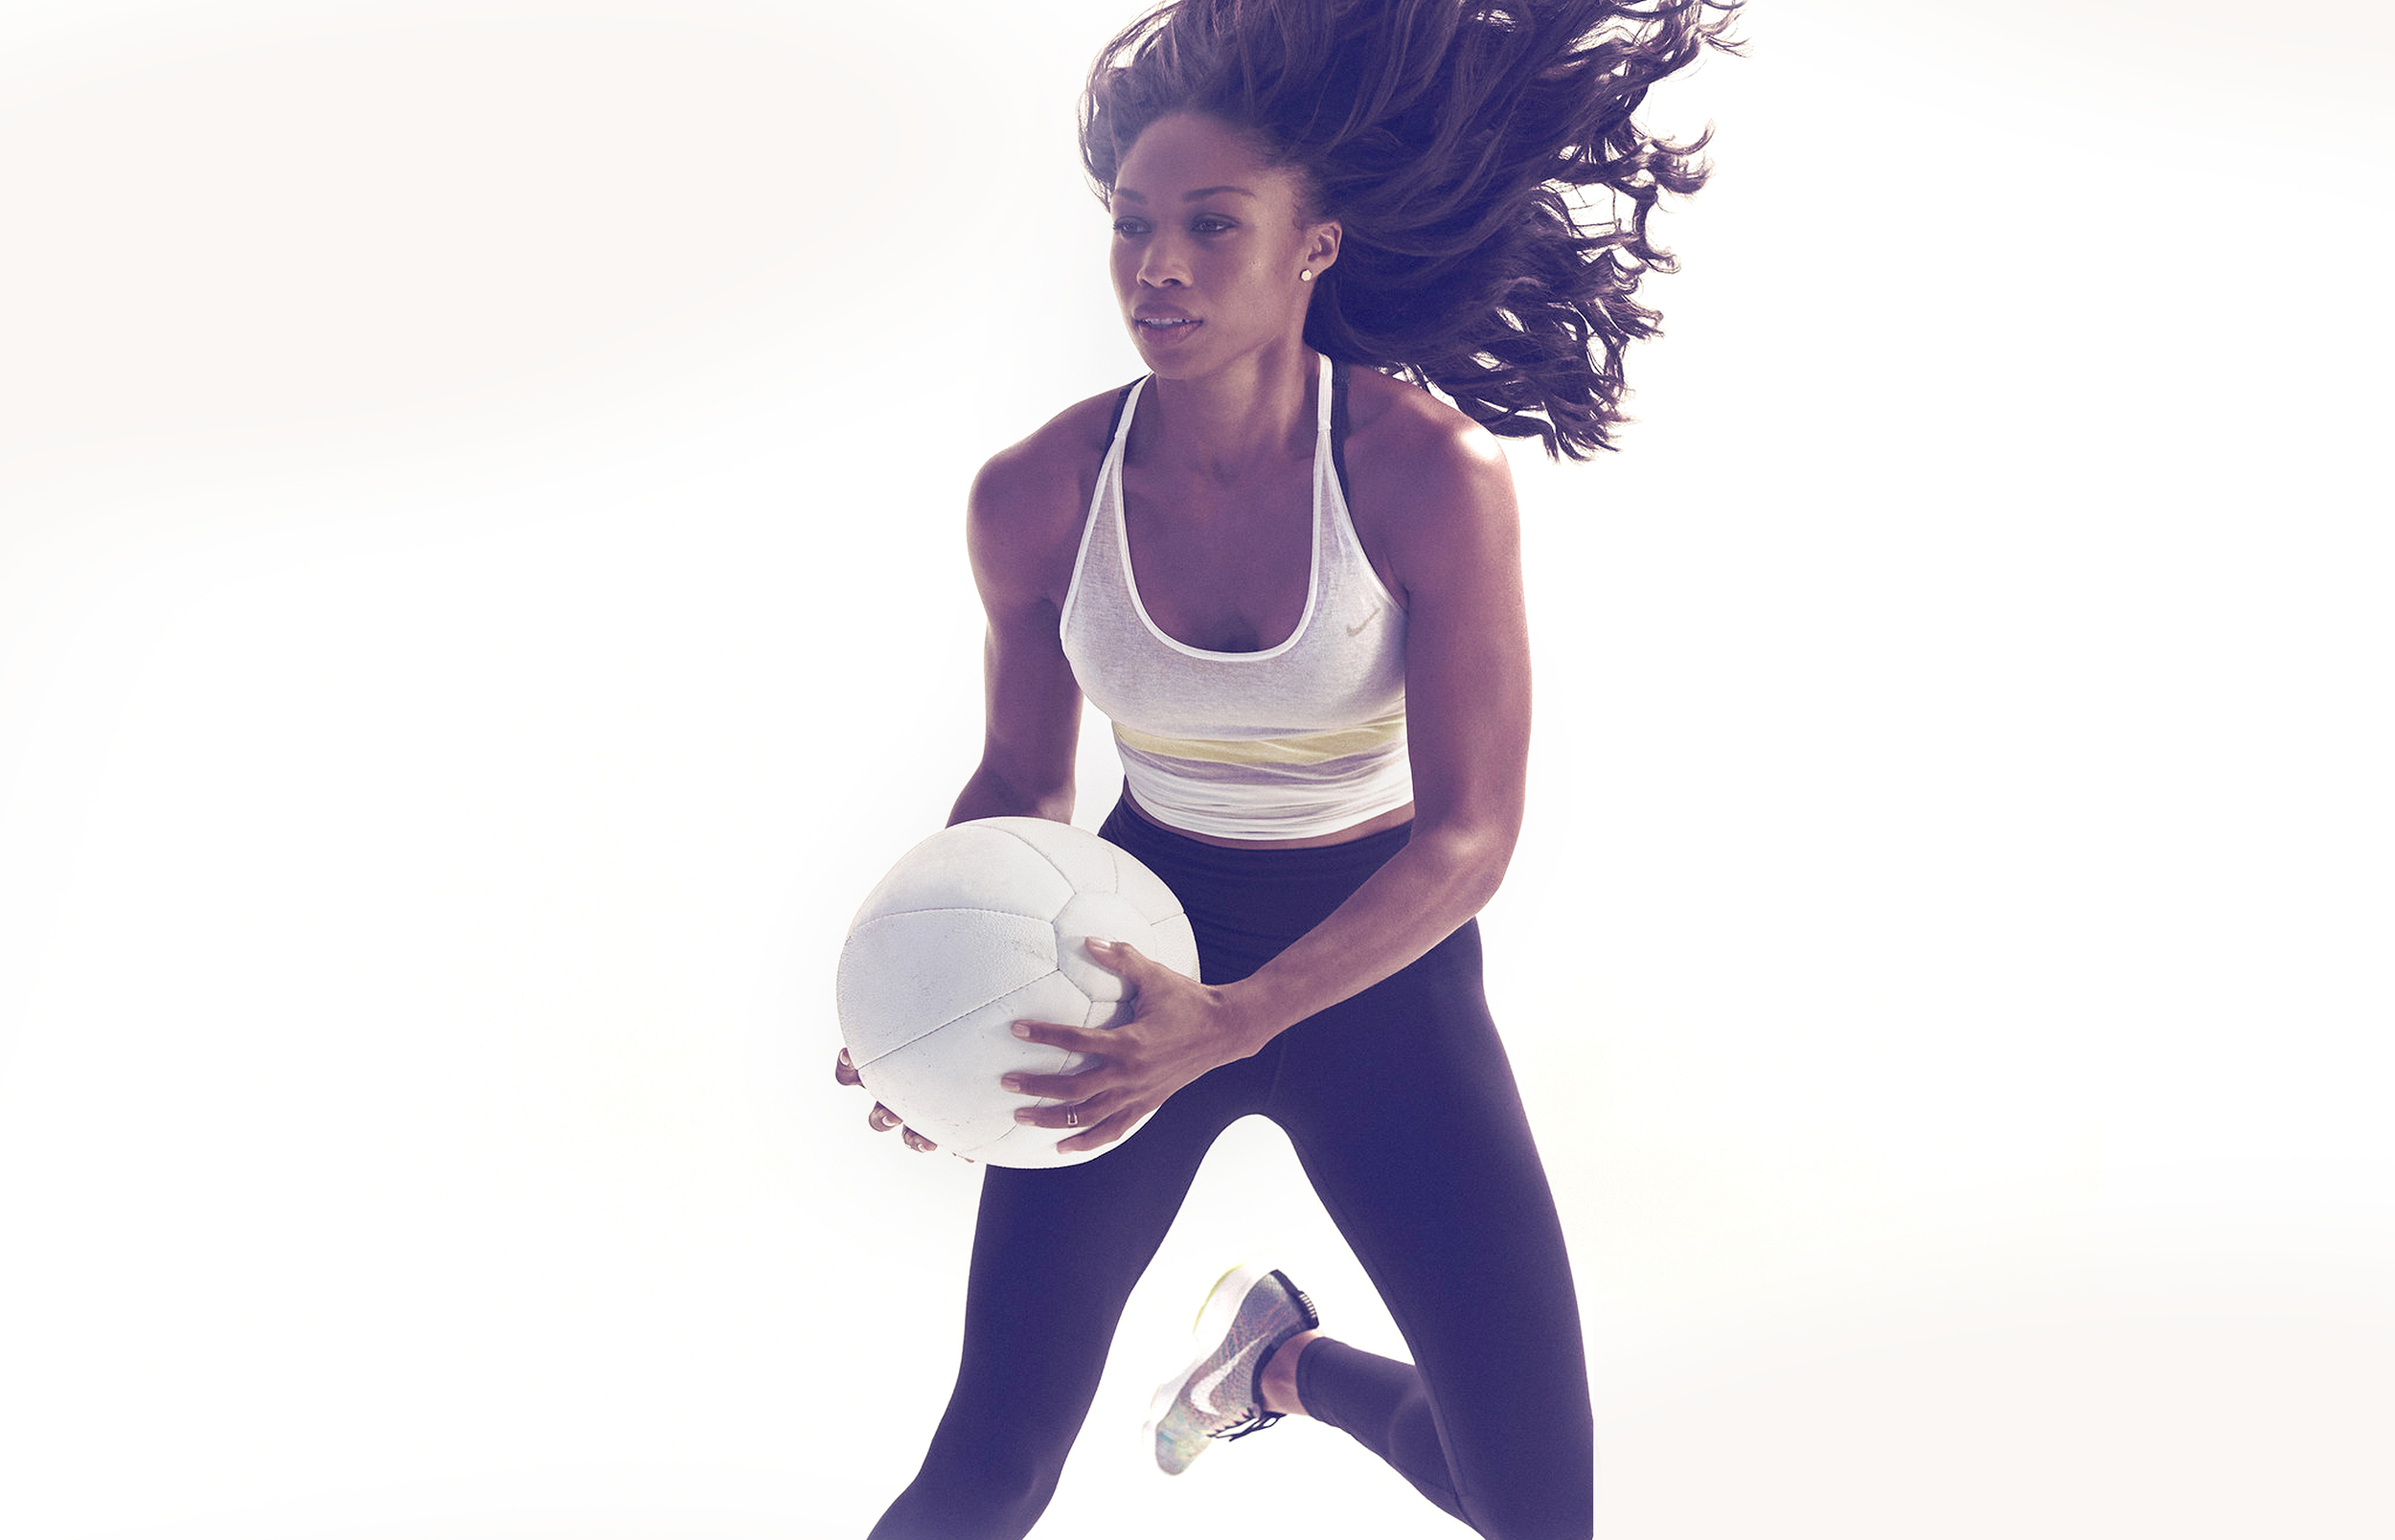 NikeTrainingClub_Image3.jpg